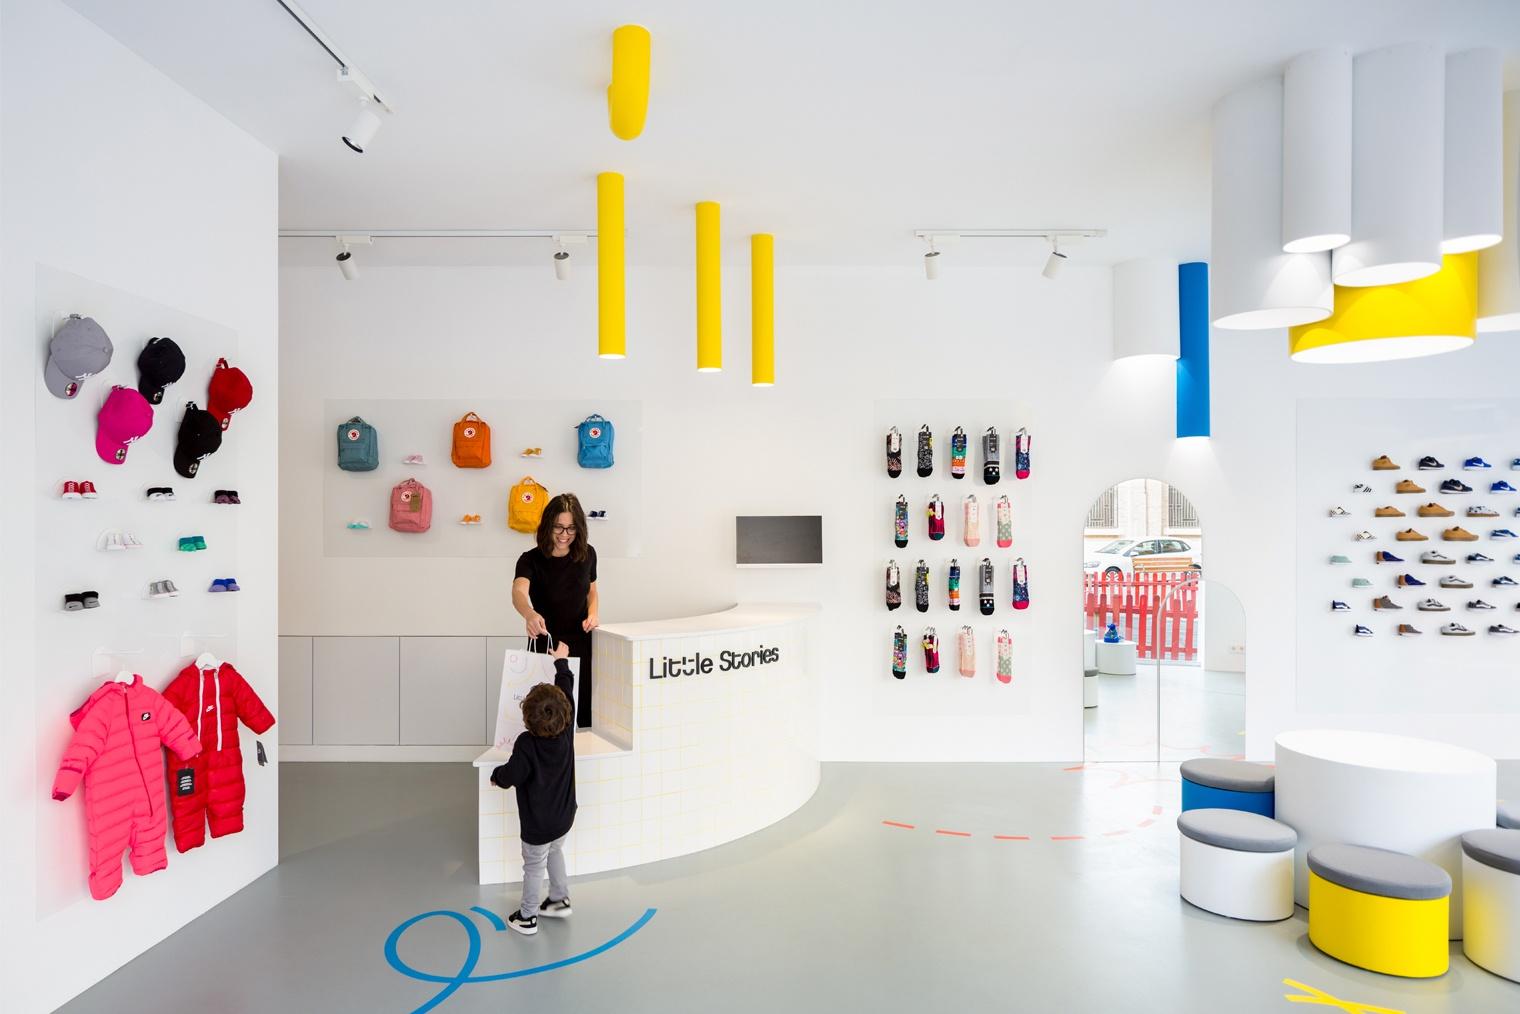 Clap studio dise a la concept store para ni os little stories en valencia - Disena studio ...